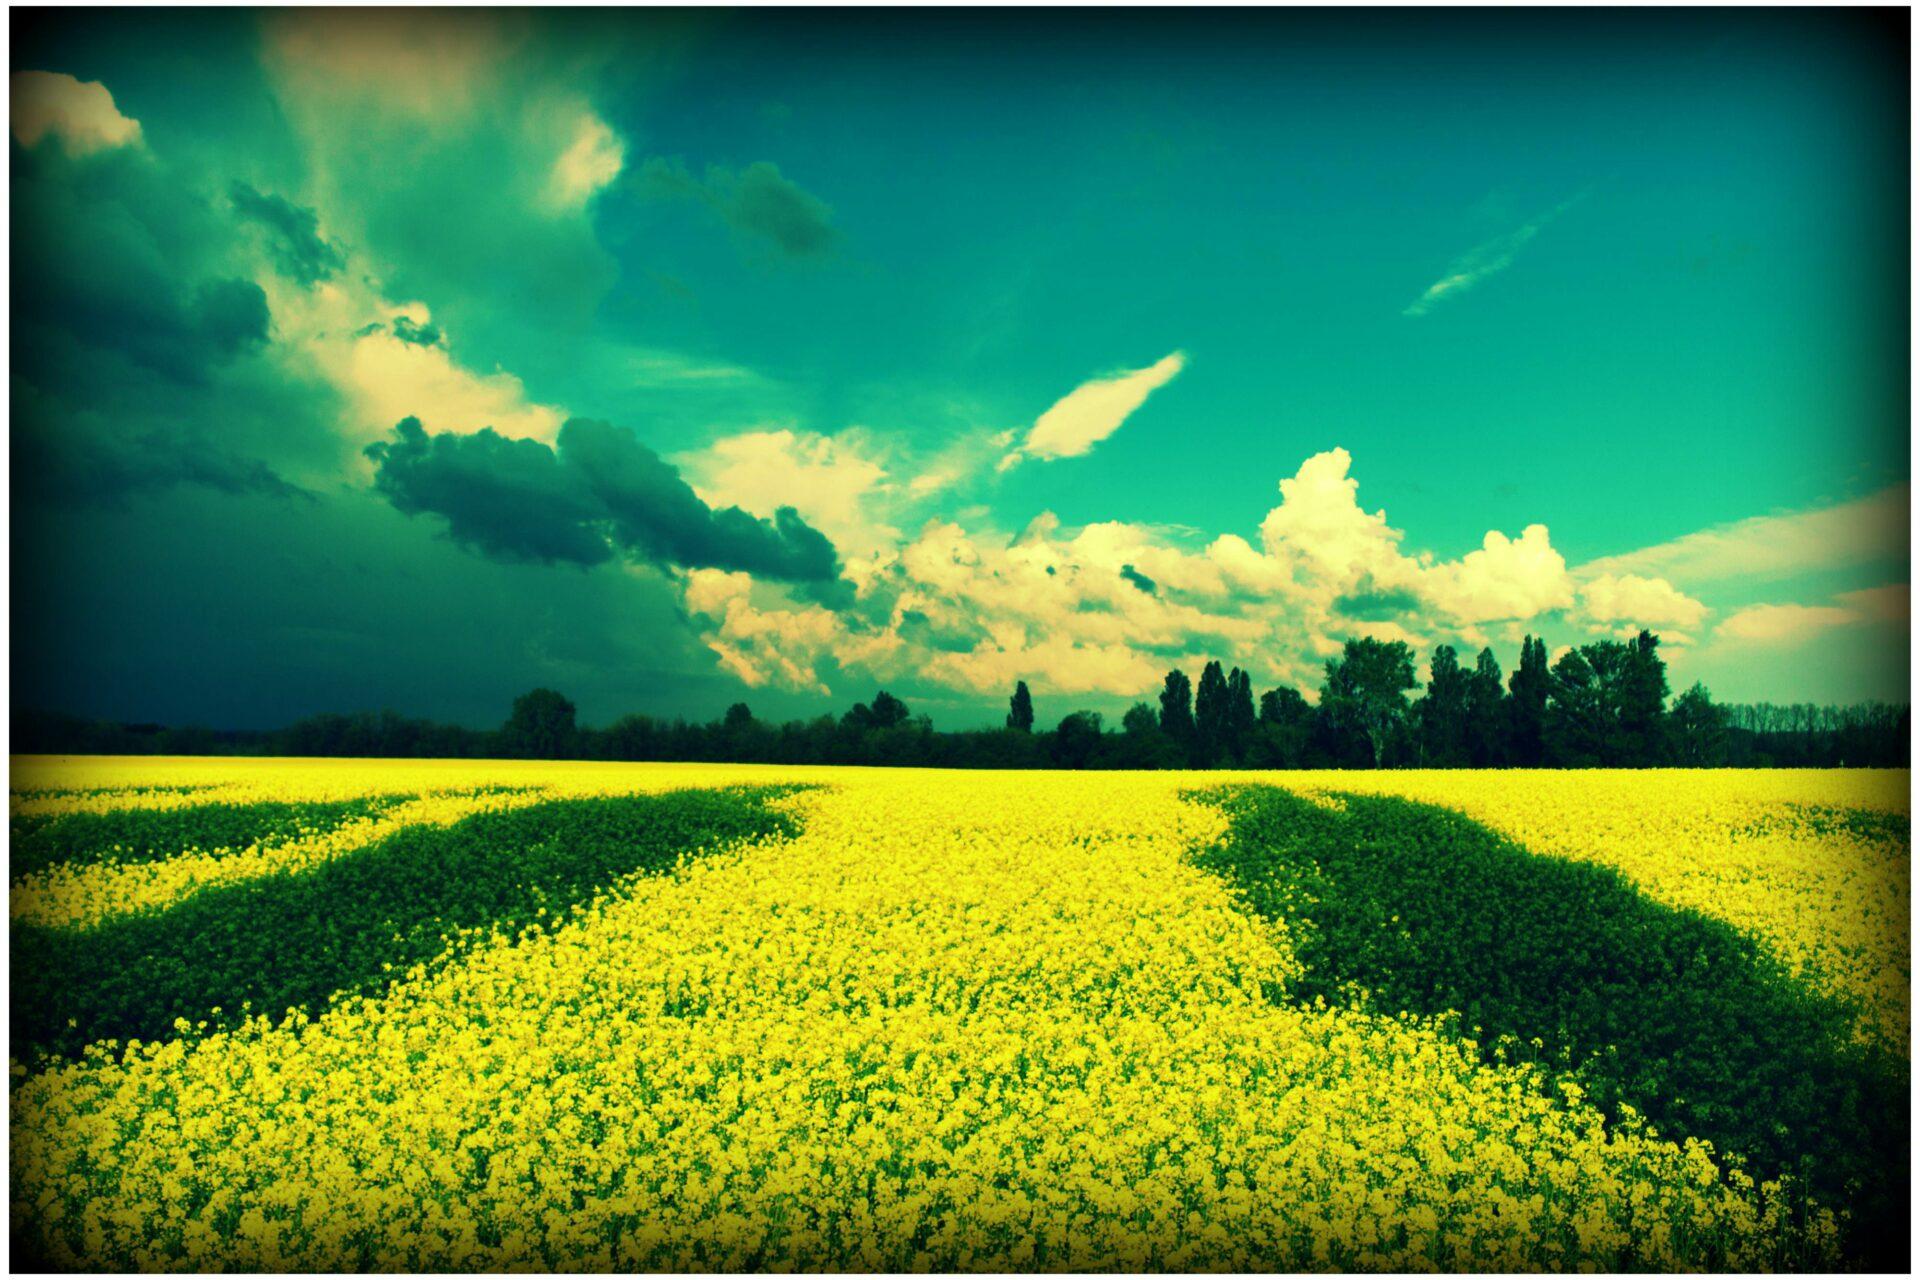 Fot. Konstantin Stupak Źródło: Goodfreephotos.com [CC0]